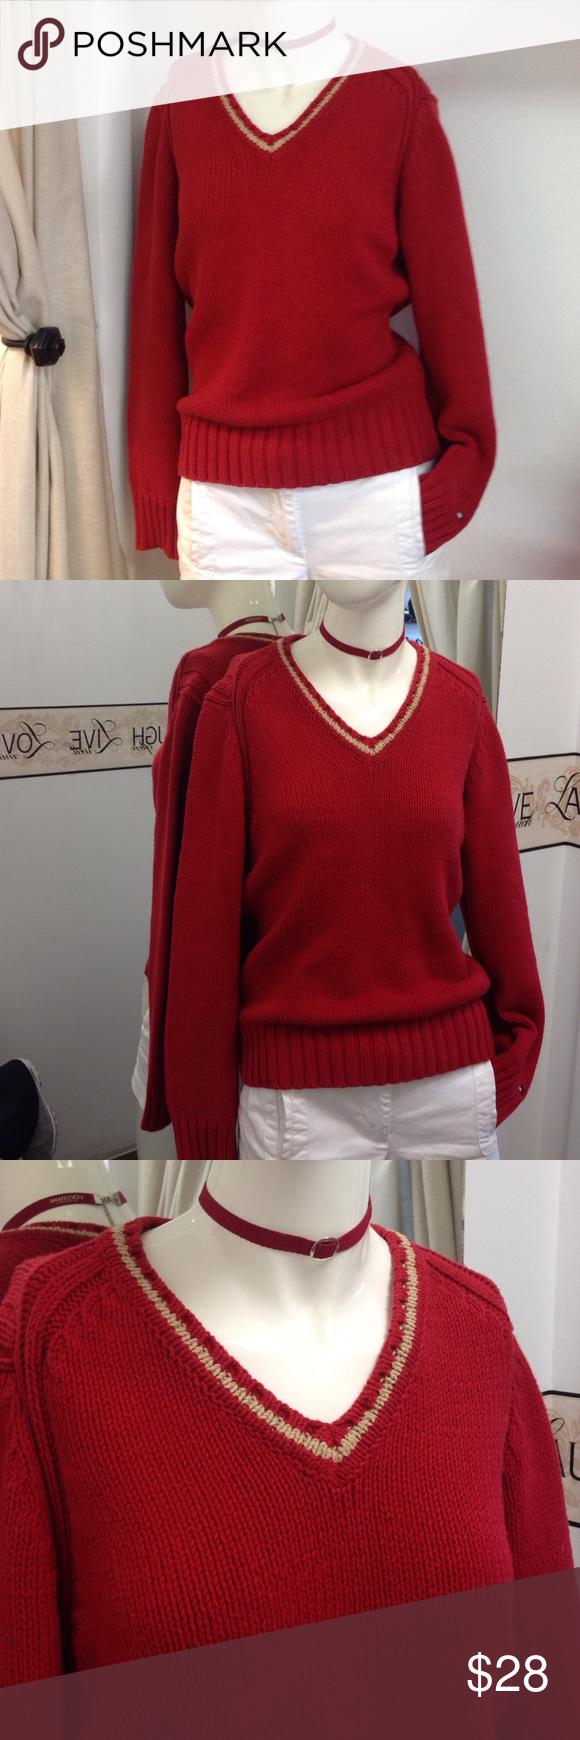 Tommy Hilfiger V-neck women's sweater Cotton laced red v-neck sweater, size M Tommy Hilfiger Sweaters V-Necks